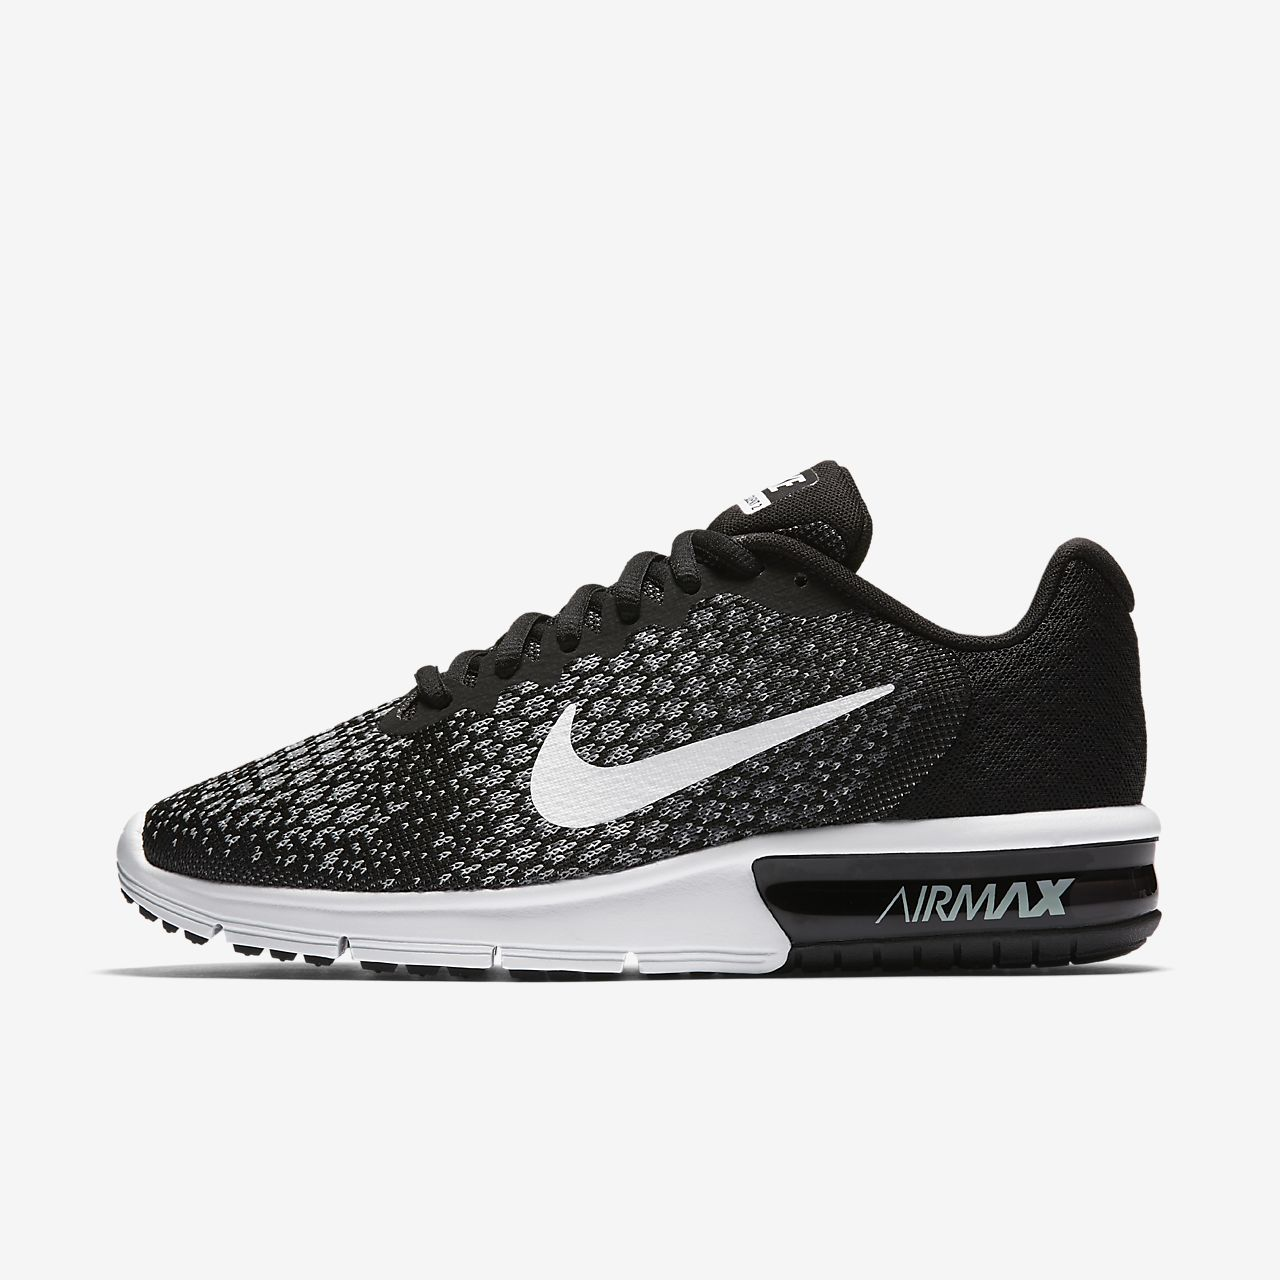 219fc380a3eb5e Nike Air Max Sequent 2 Women s Shoe. Nike.com GB